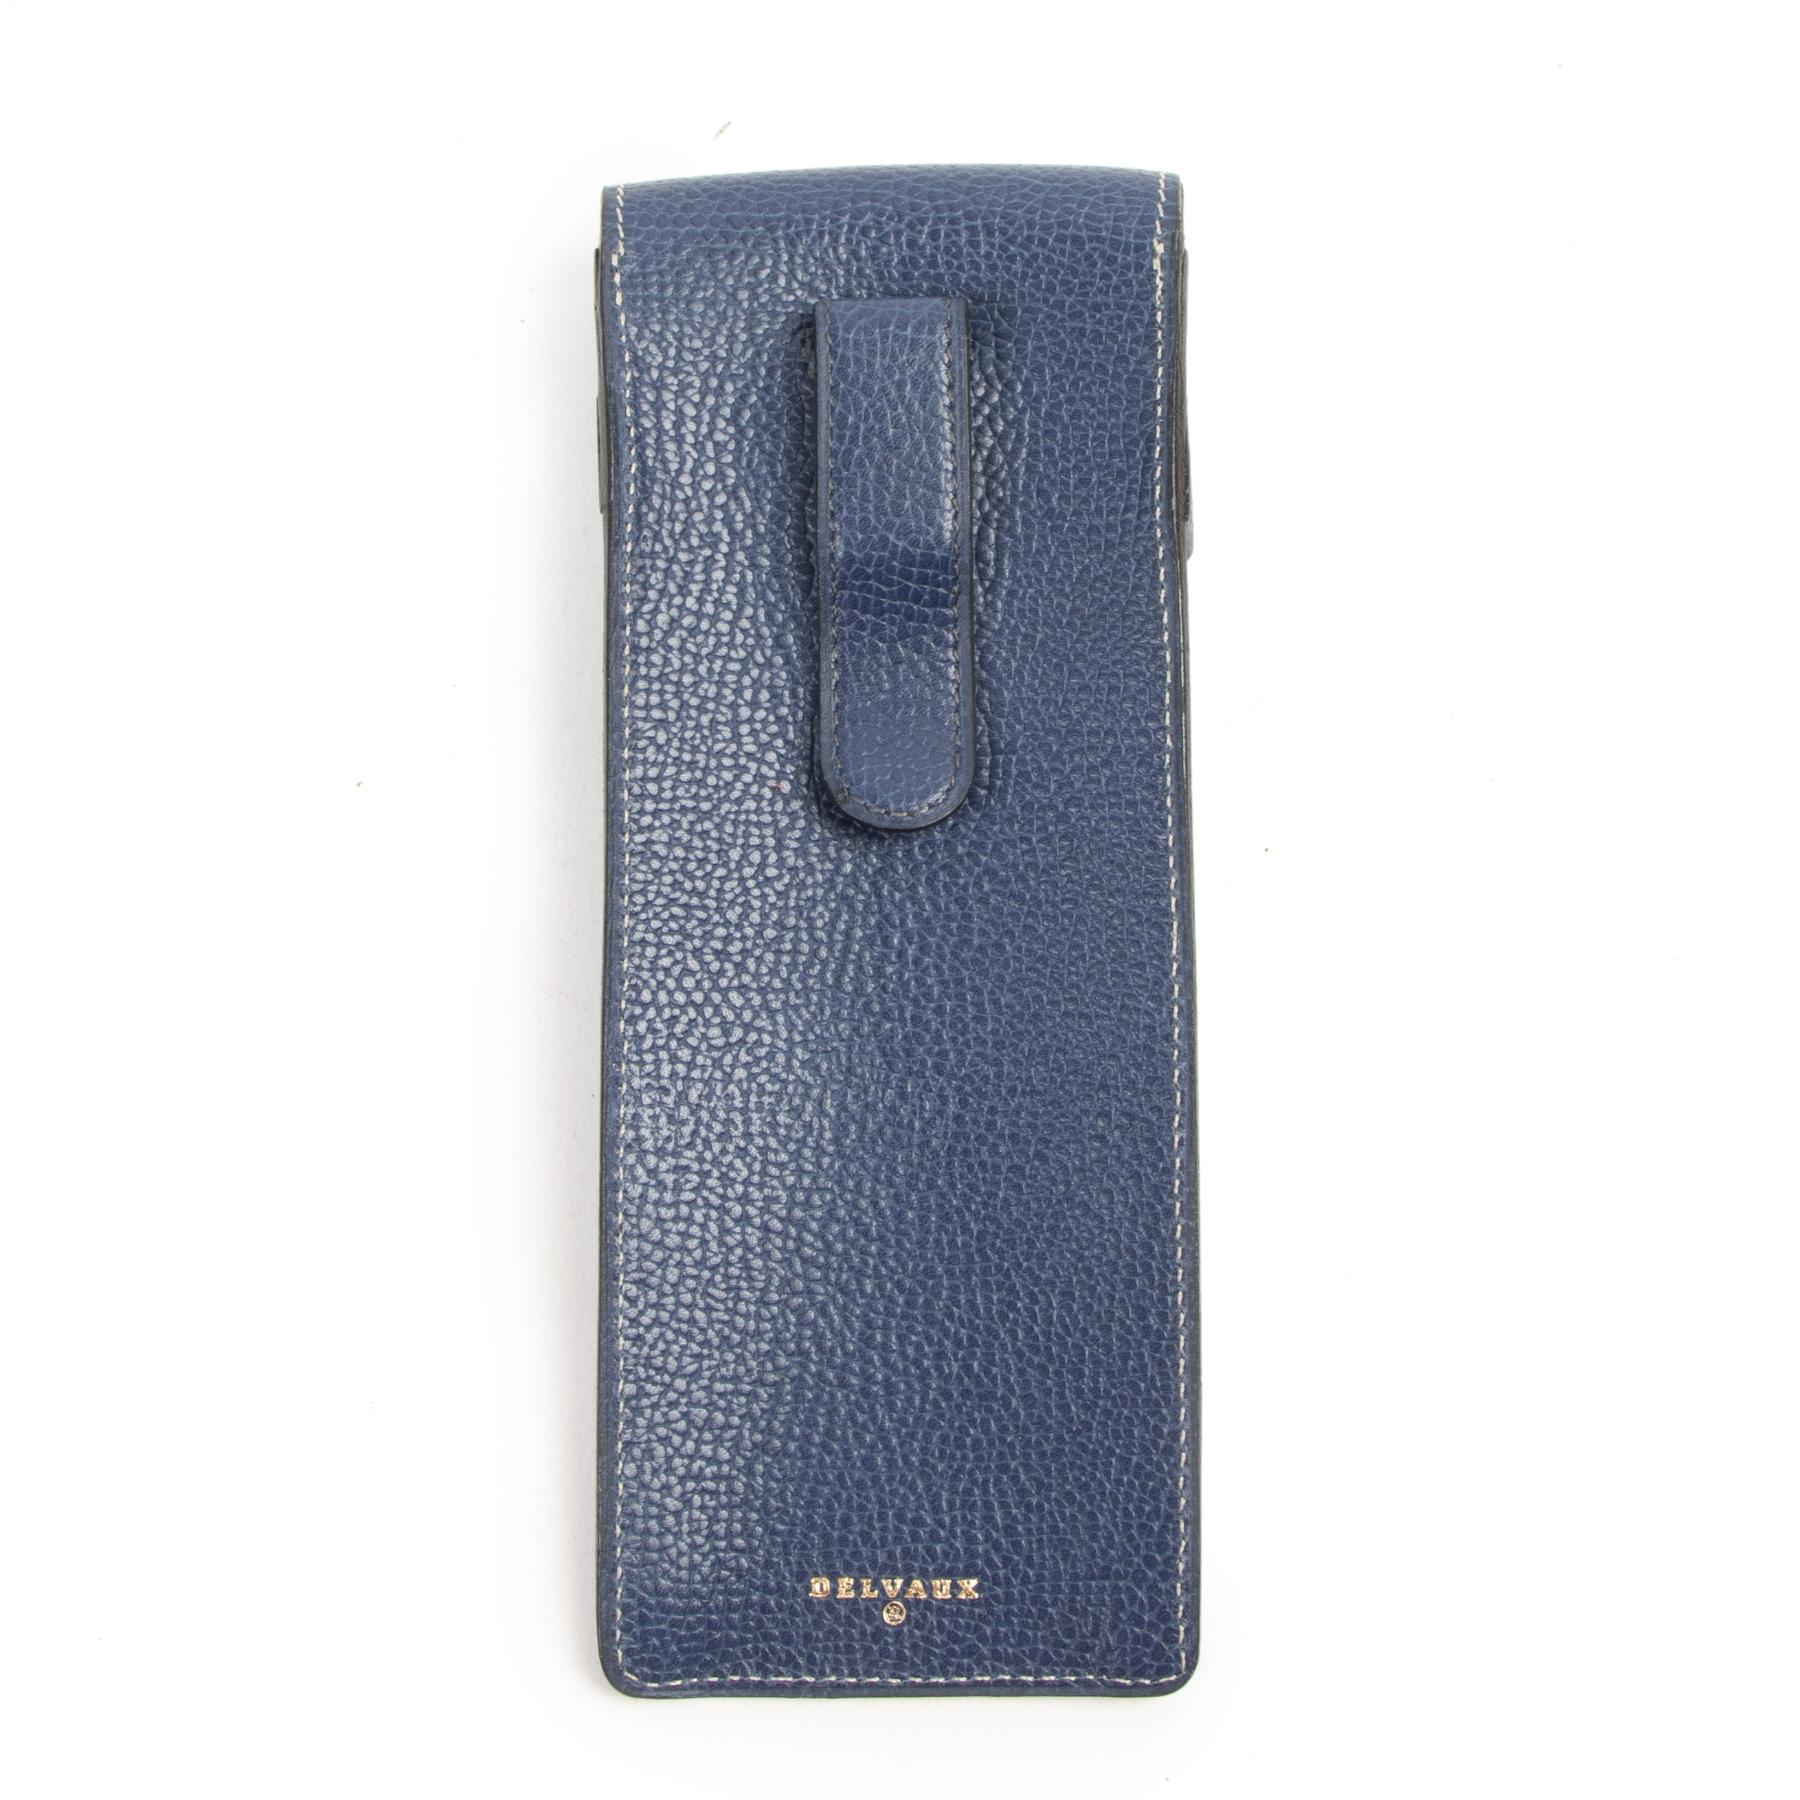 Authentieke tweedehands vintage Delvaux Blue Leather Pencil Case koop online webshop LabelLOV